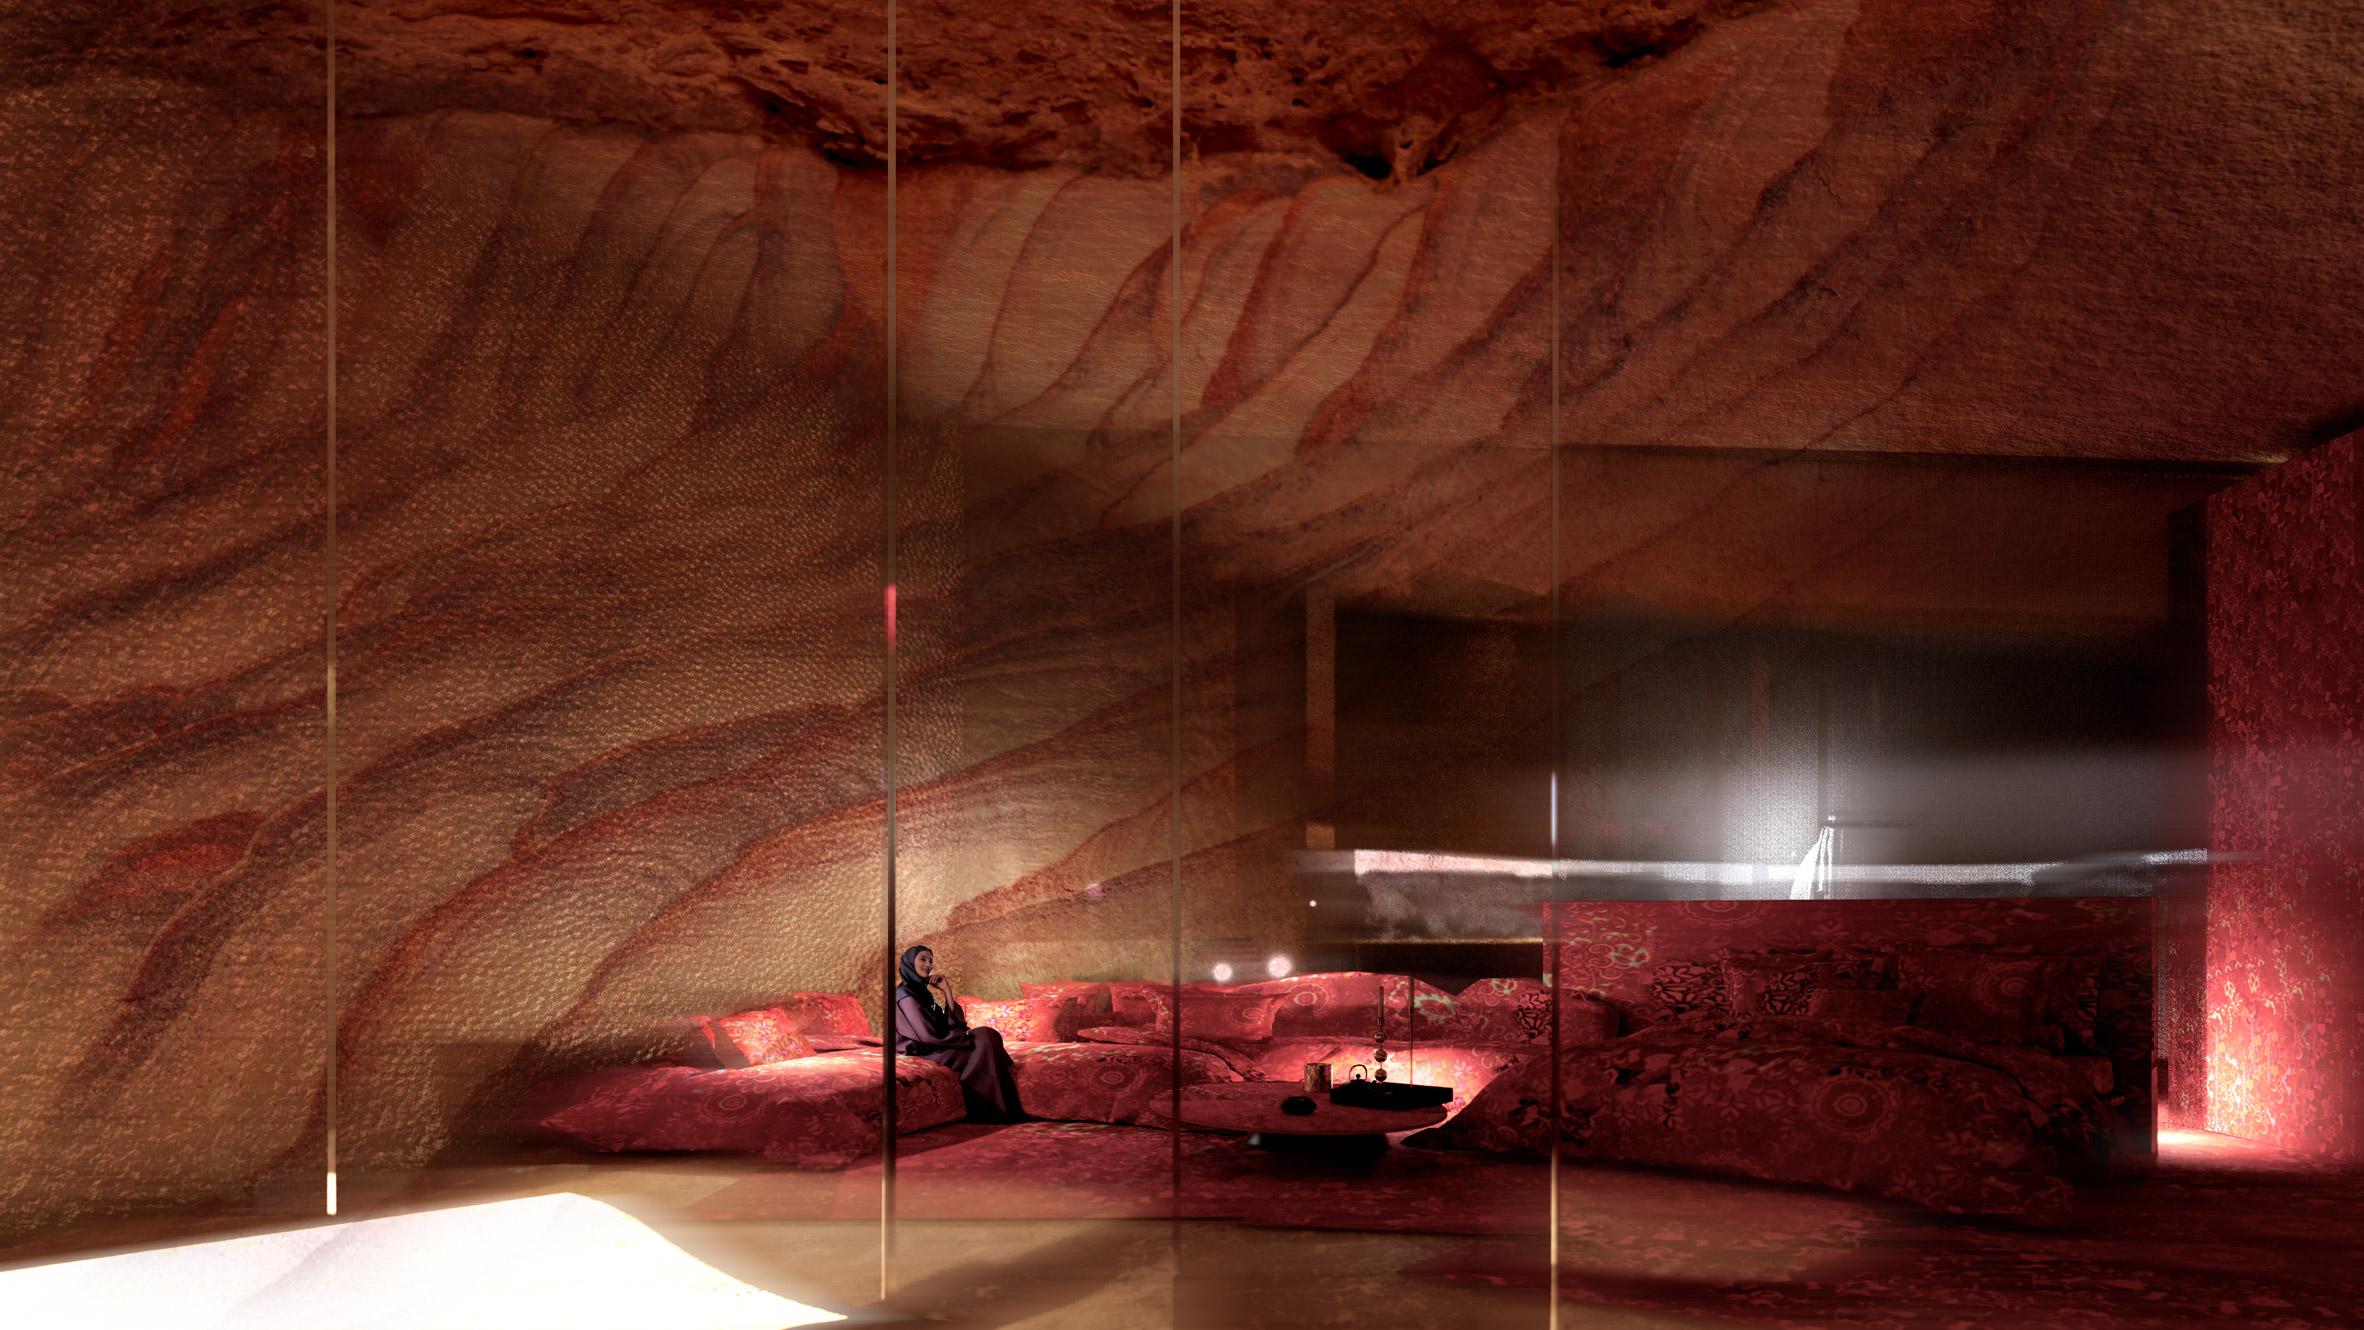 Suites / Sharaan by Jean Nouvel hotel in Saudi Arabia